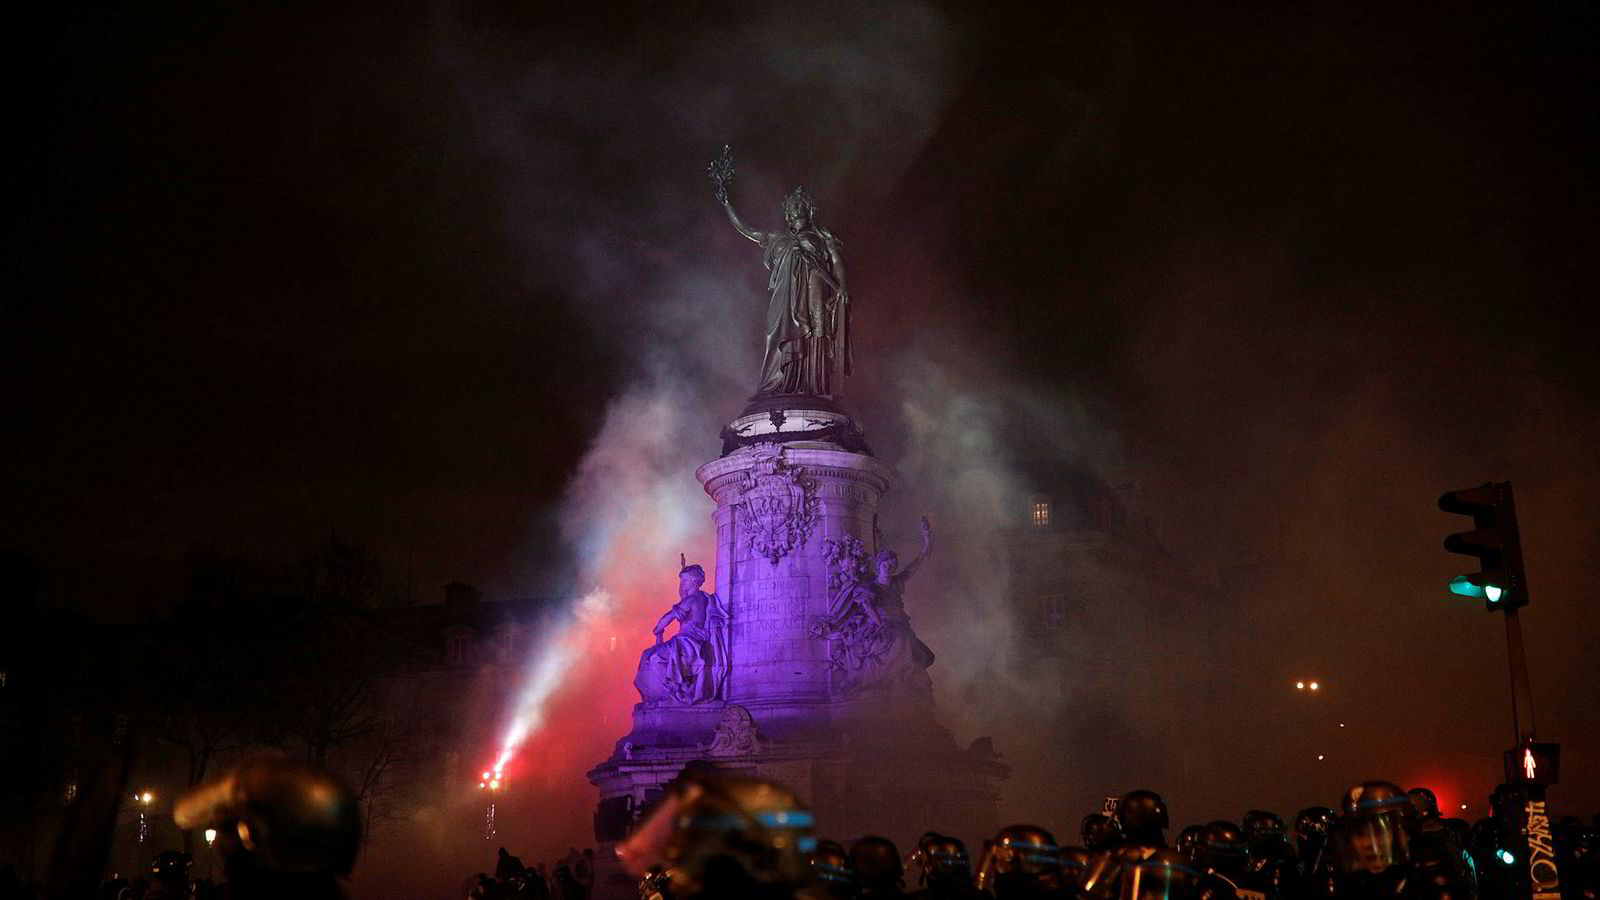 Røyk fyller luften mens politiet samler seg på Place de la republique i Paris på lørdag denne uken.